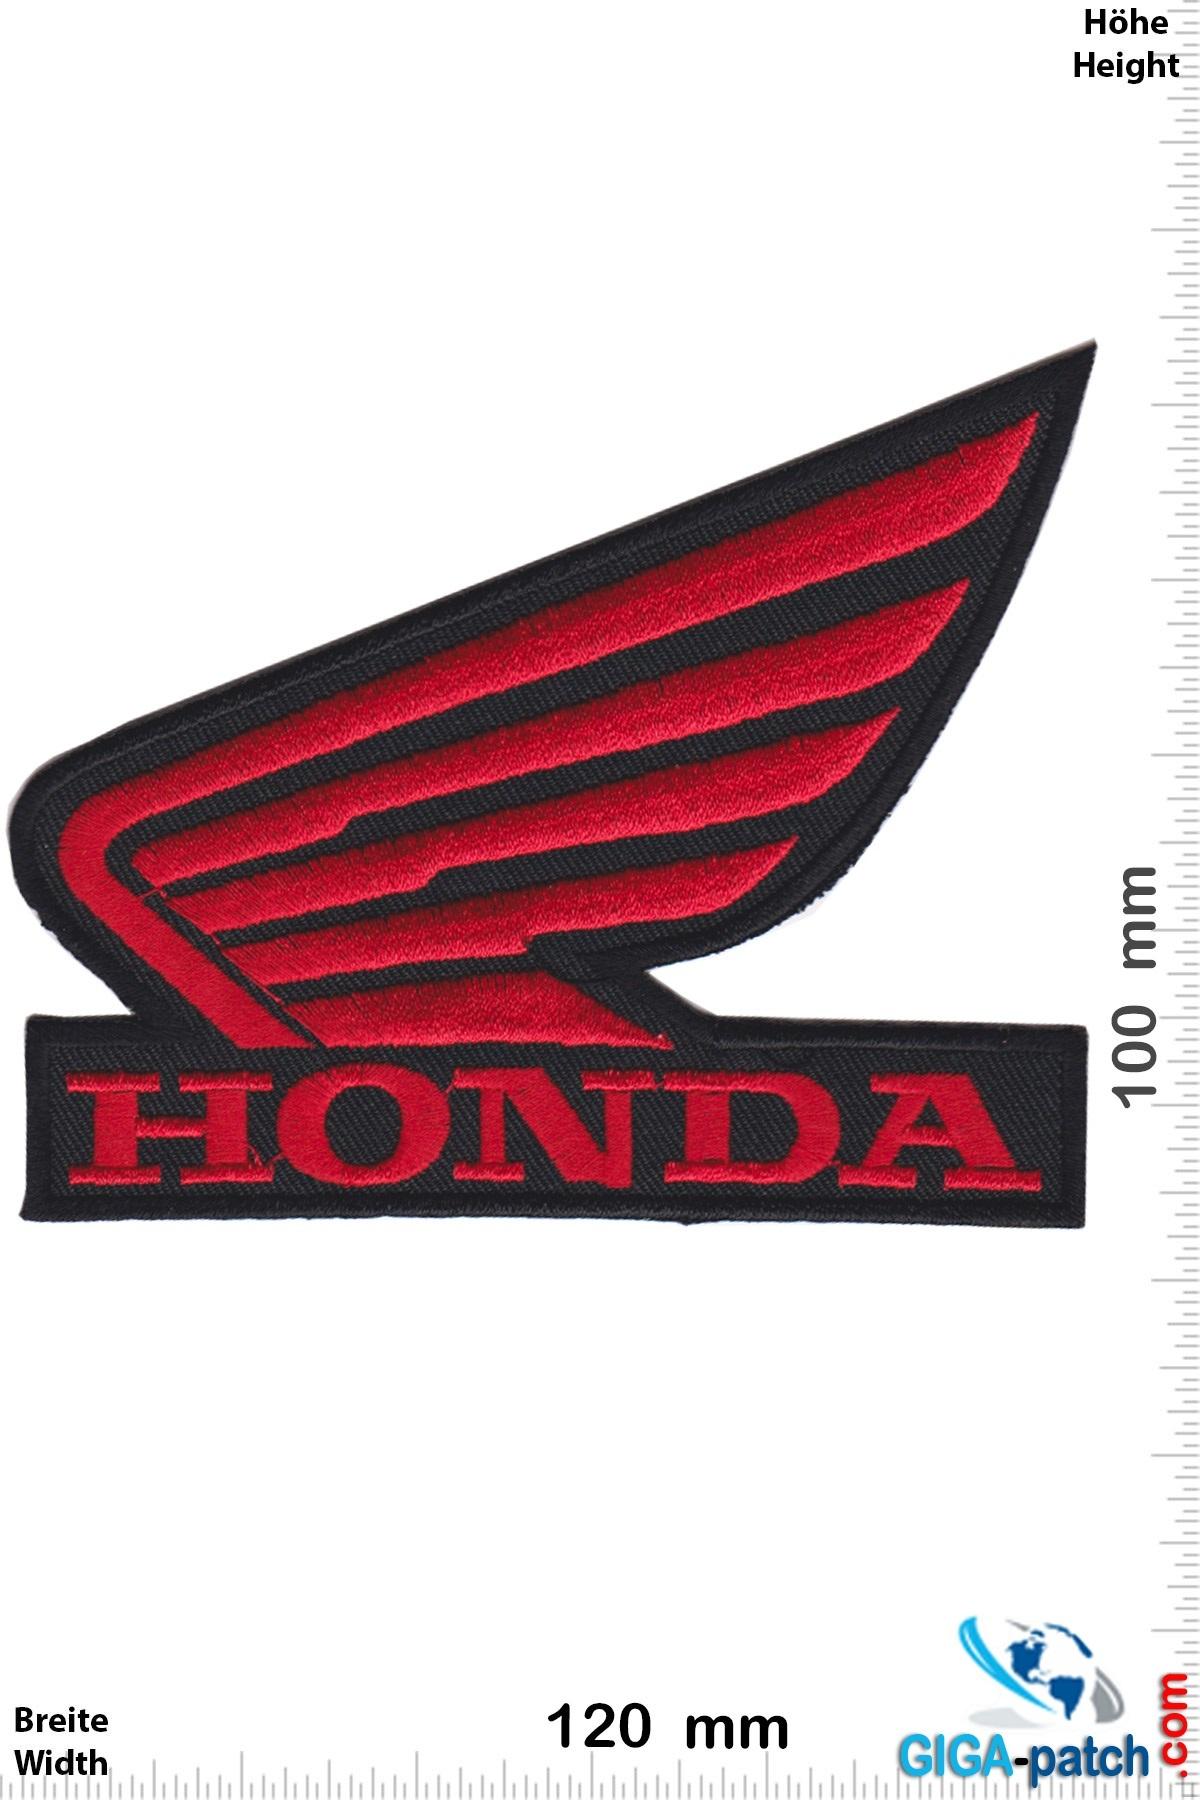 Honda Honda - Flügel - rot schwarz - big